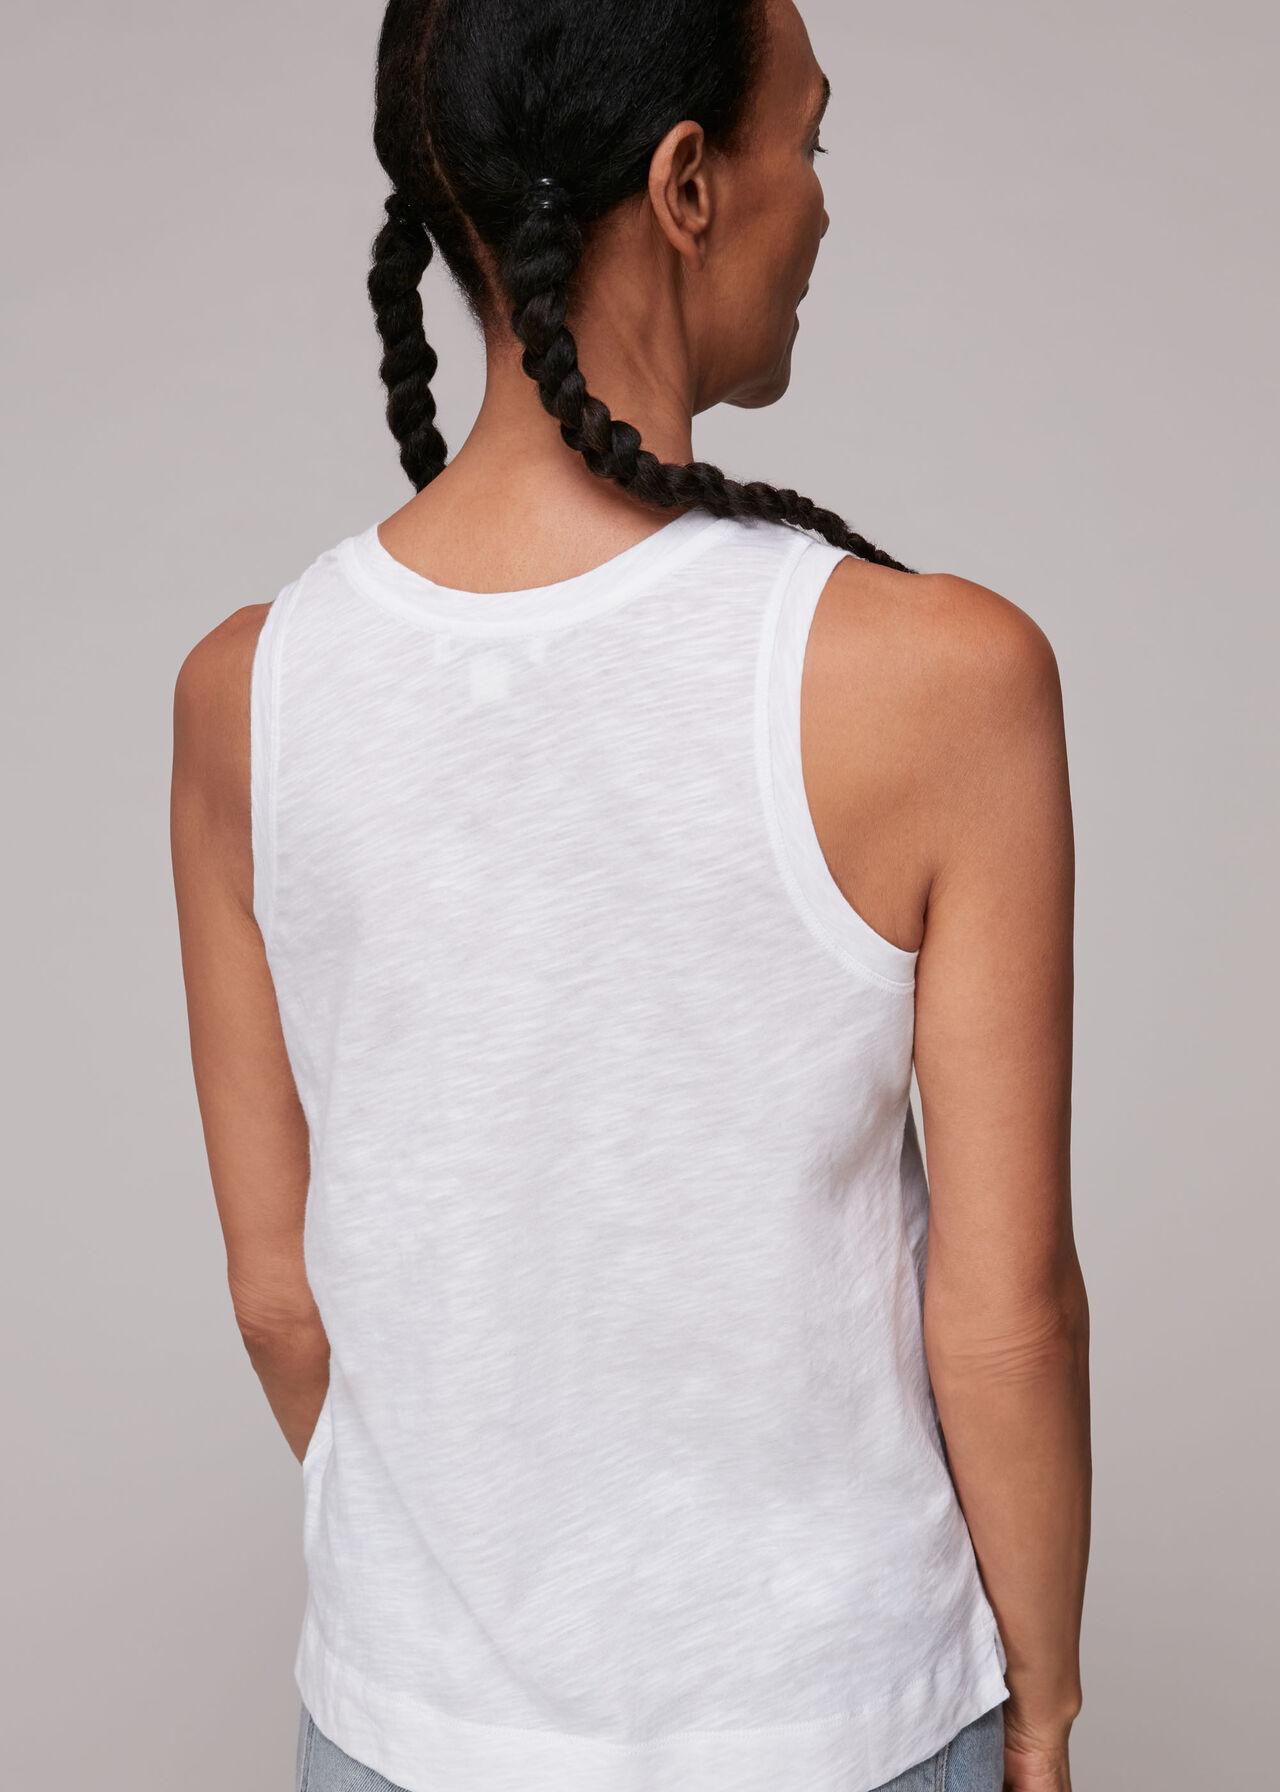 Easy Basic Vest Top